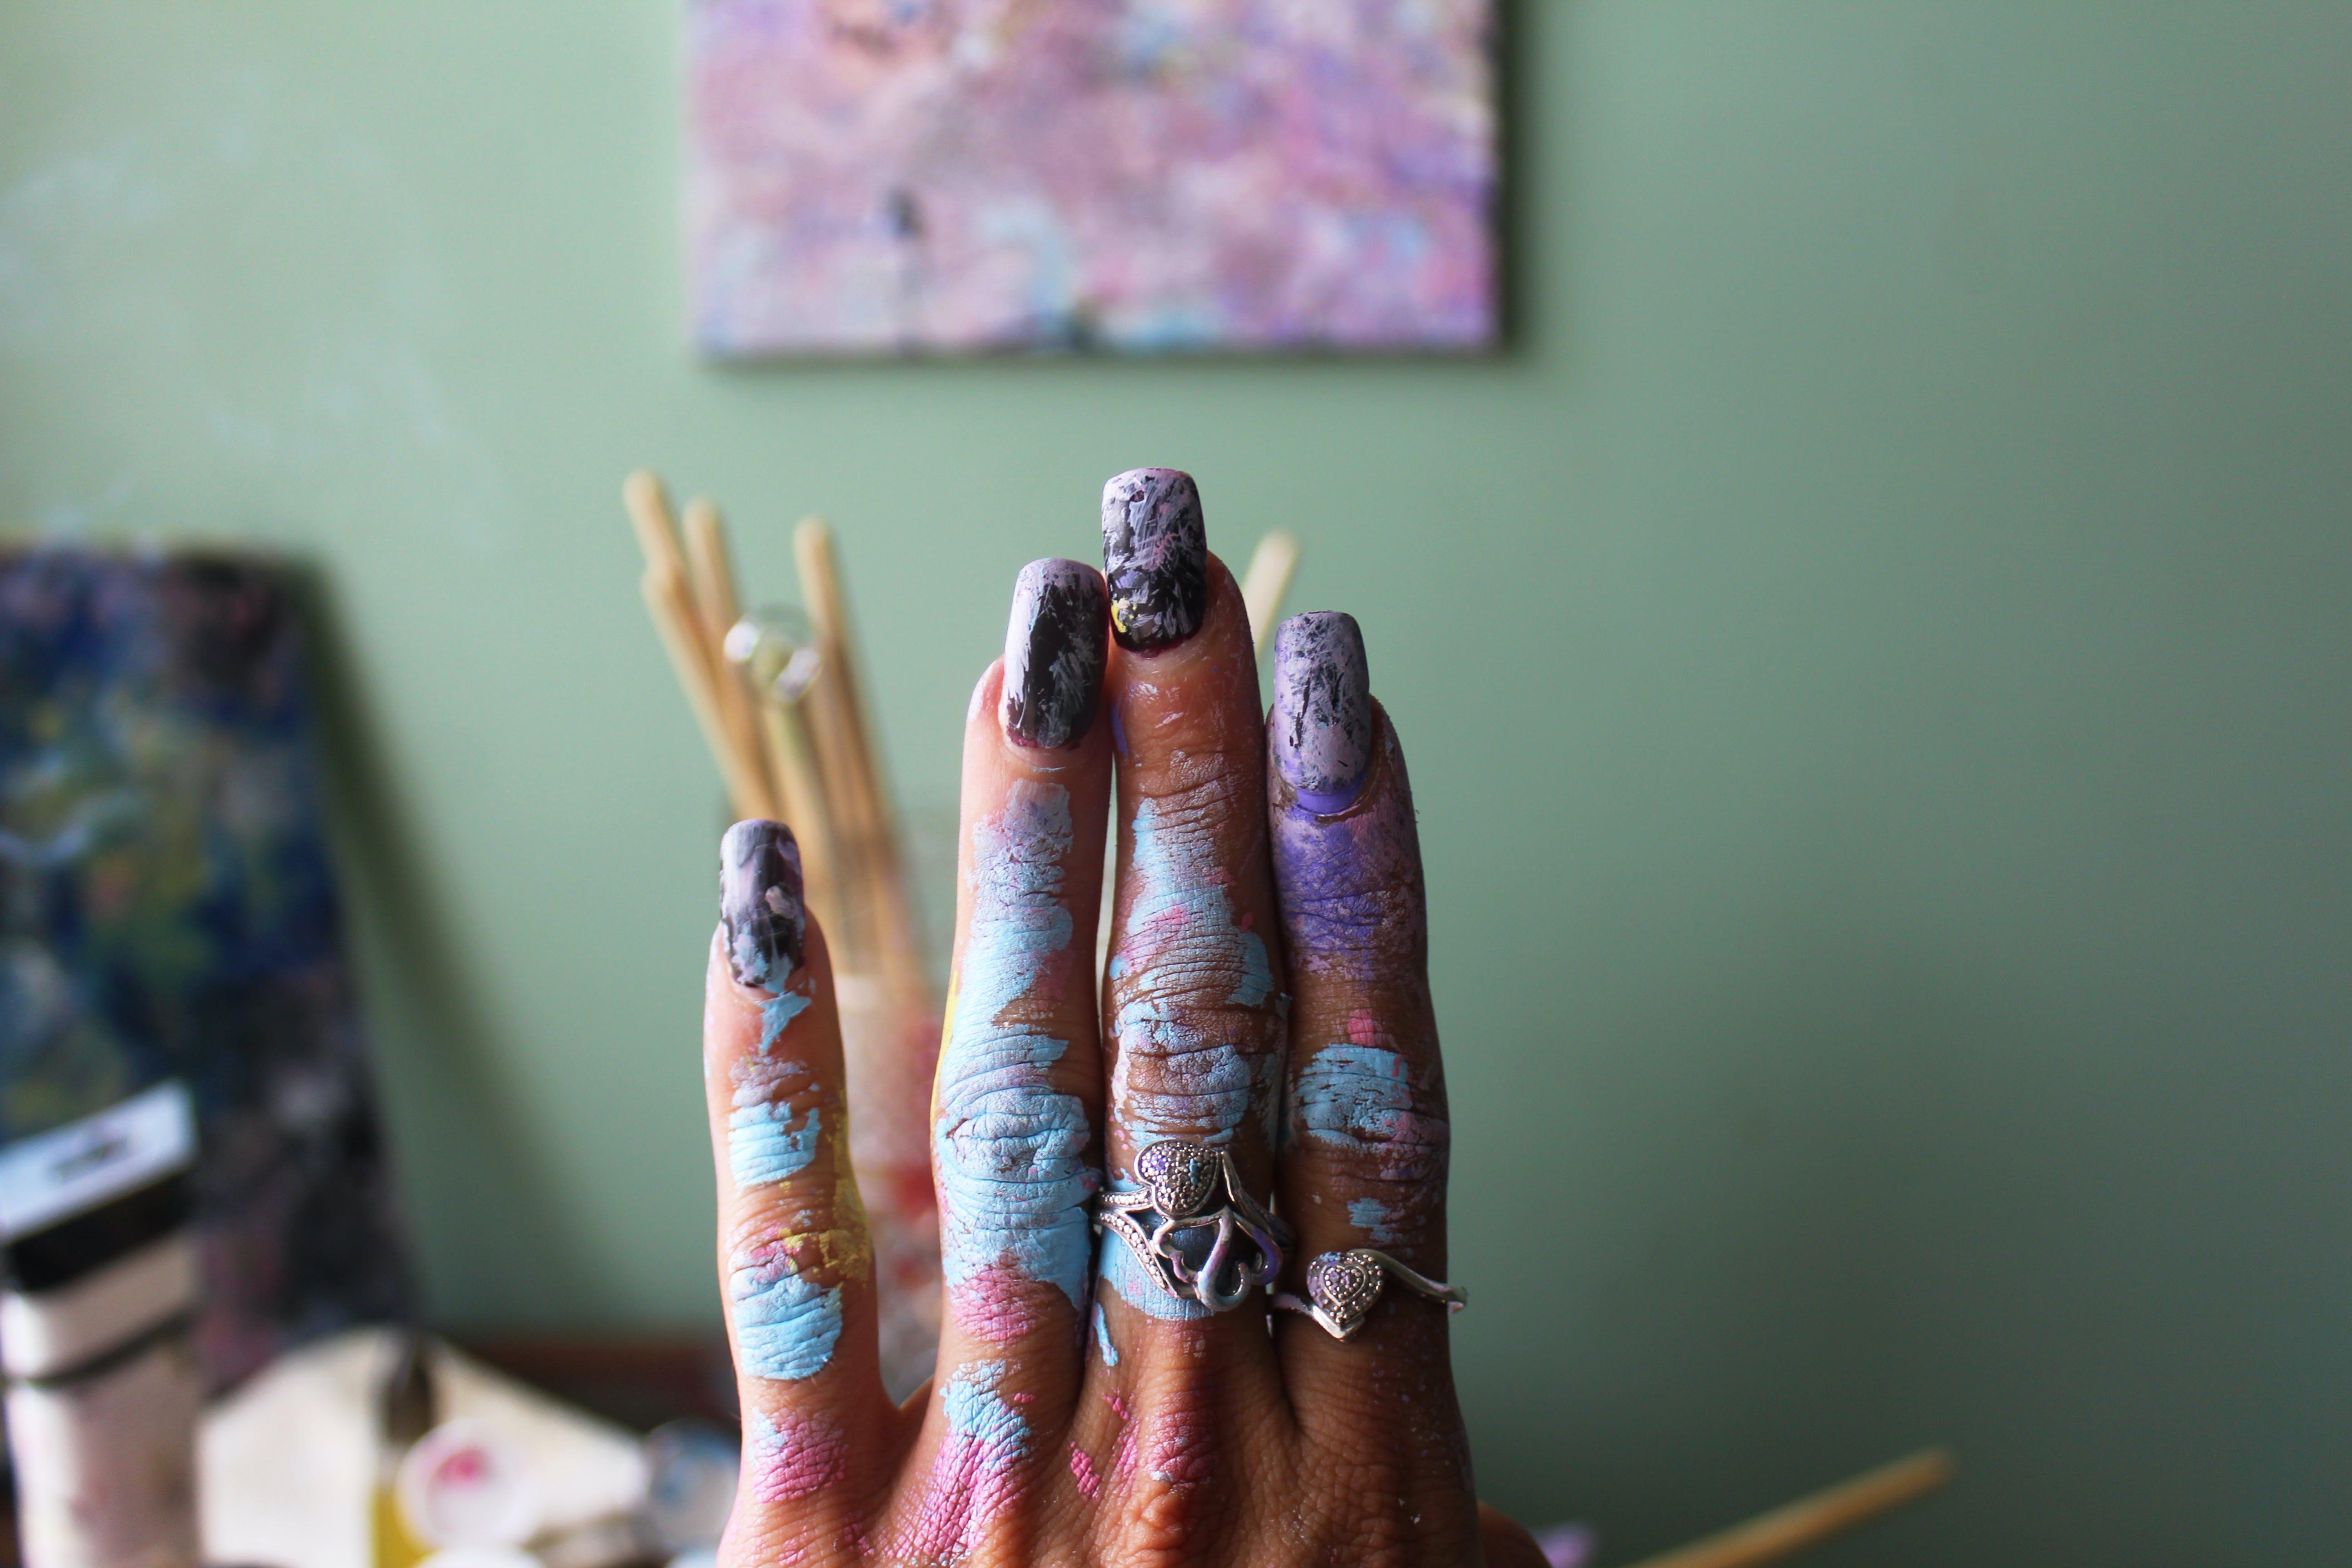 Gratis stockfoto met binnen, blurry achtergrond, close-up, gemanicuurde nagels